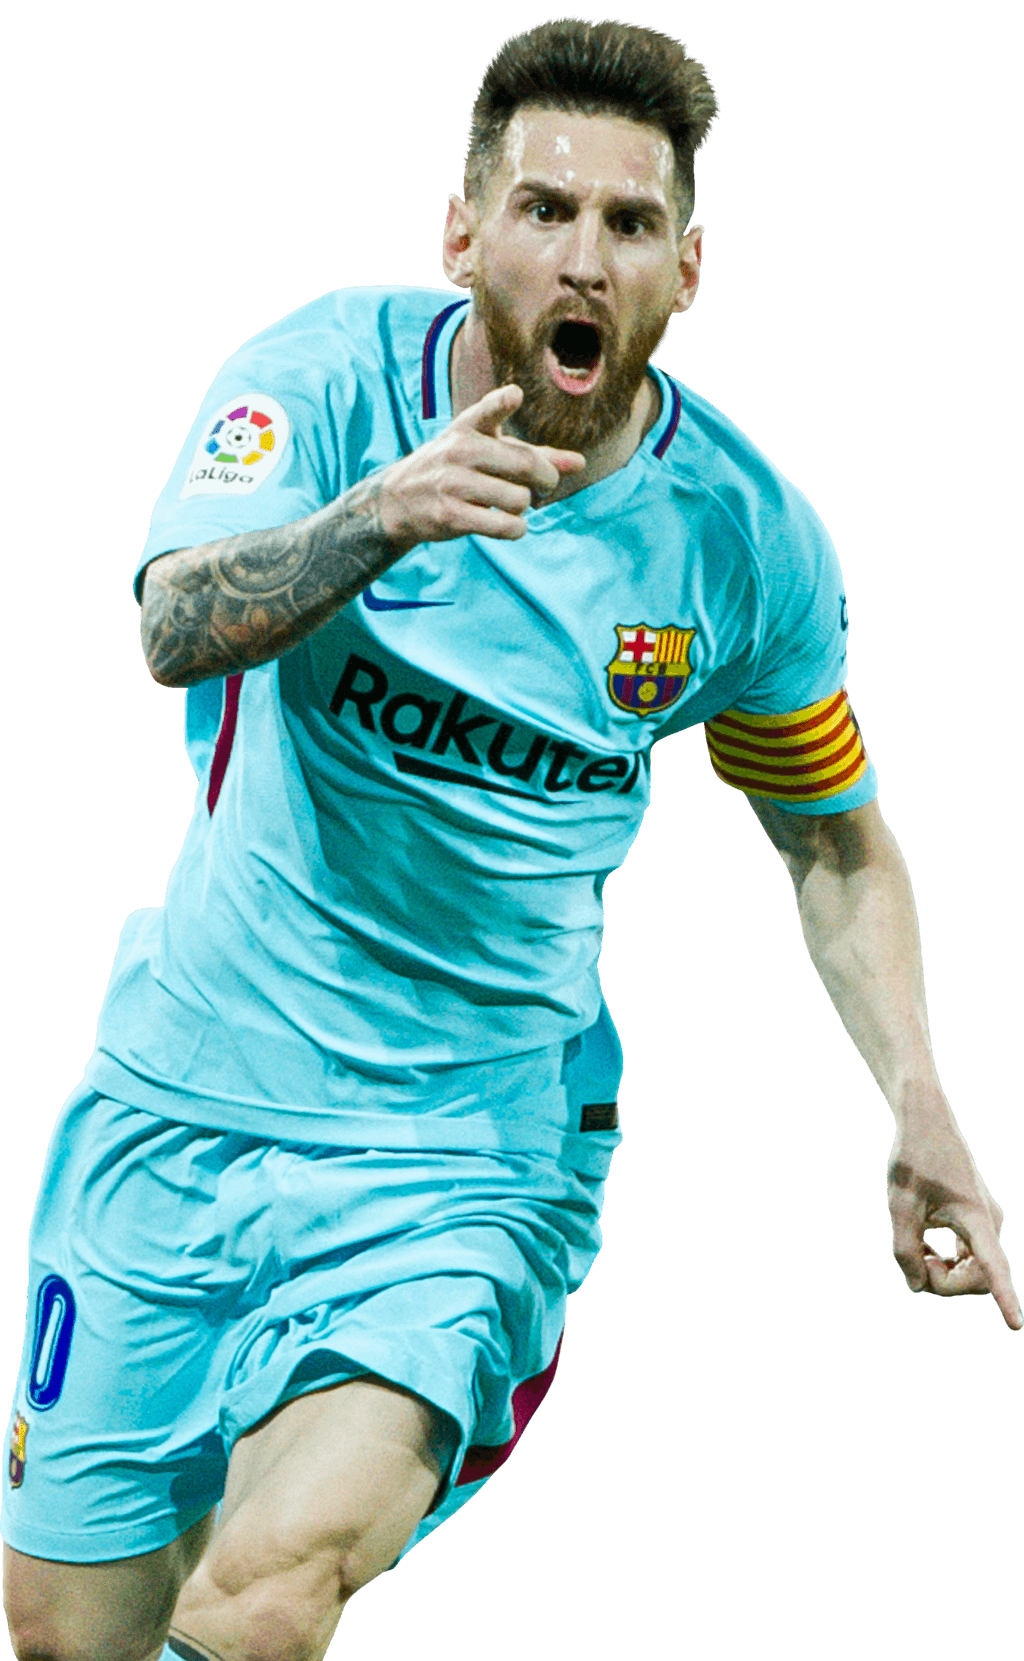 Lionel Messi Png 2018 Fcb Rakuten By Igorband.